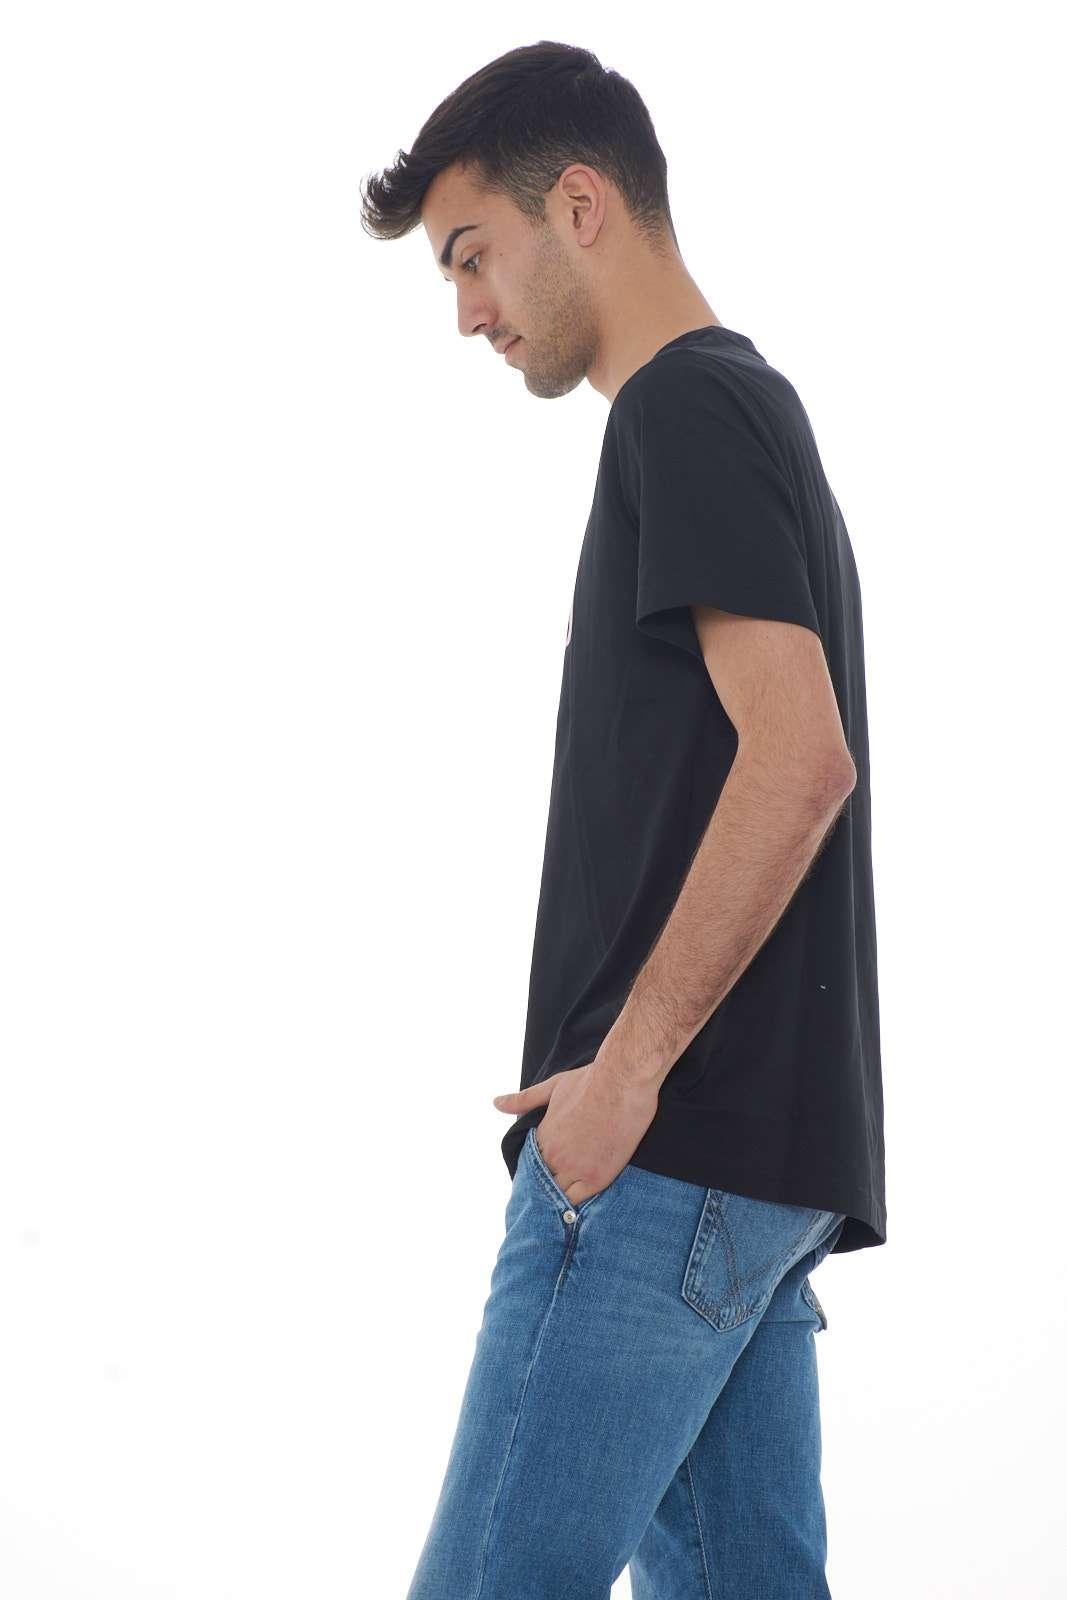 https://www.parmax.com/media/catalog/product/a/i/PE-outlet_parmax-t-shirt-uomo-Levis-699780044-B.jpg